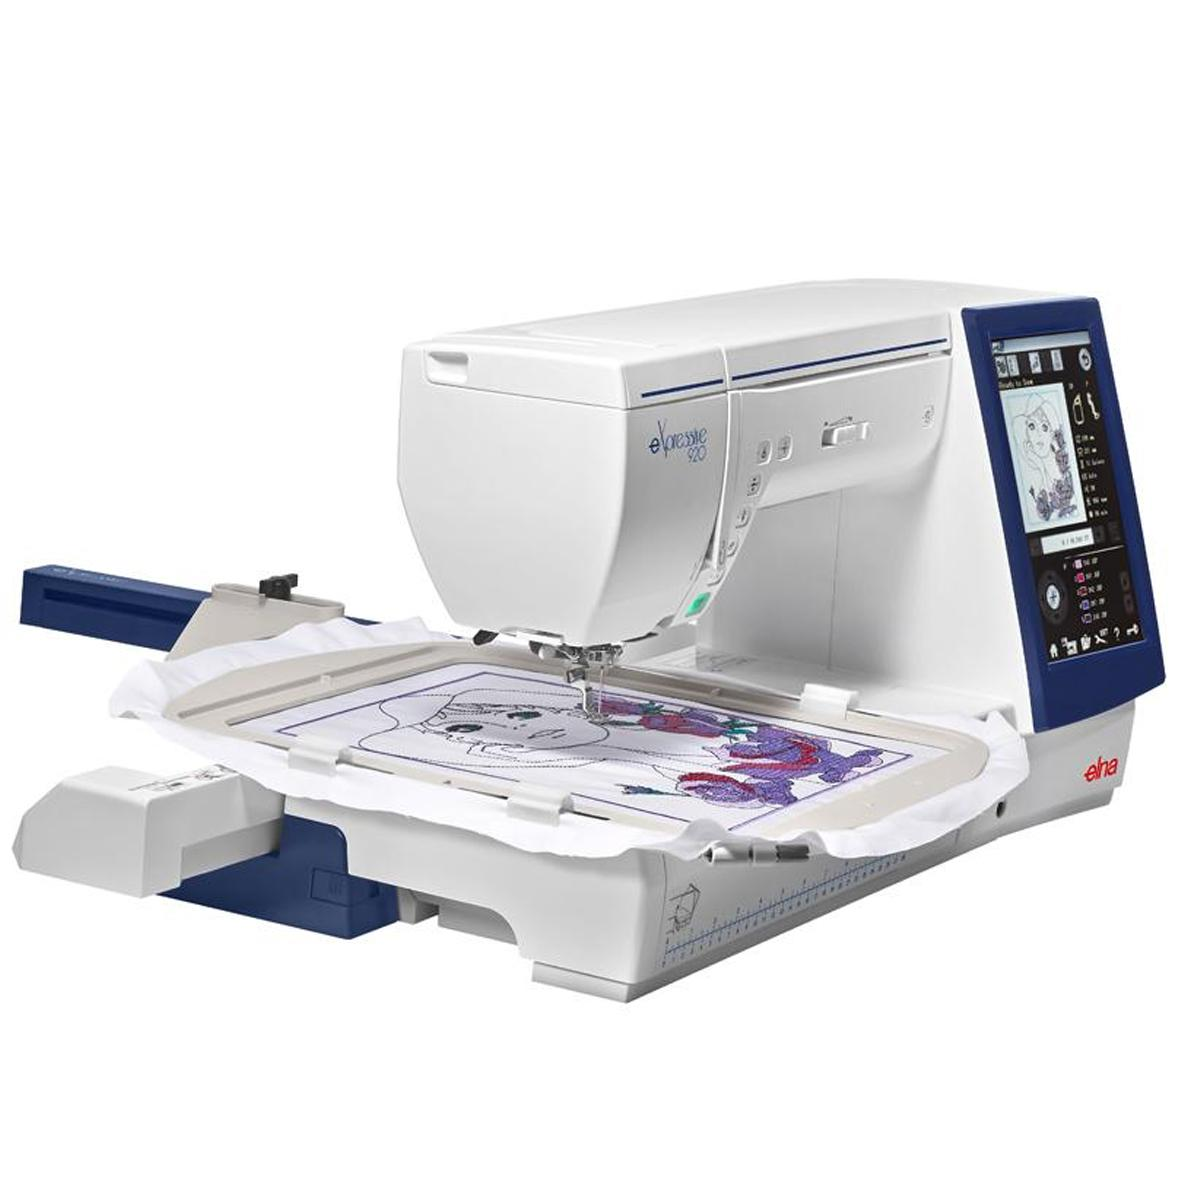 Elna eXpressive 920   Frank Nutt Sewing Machines Ltd   Buy ...